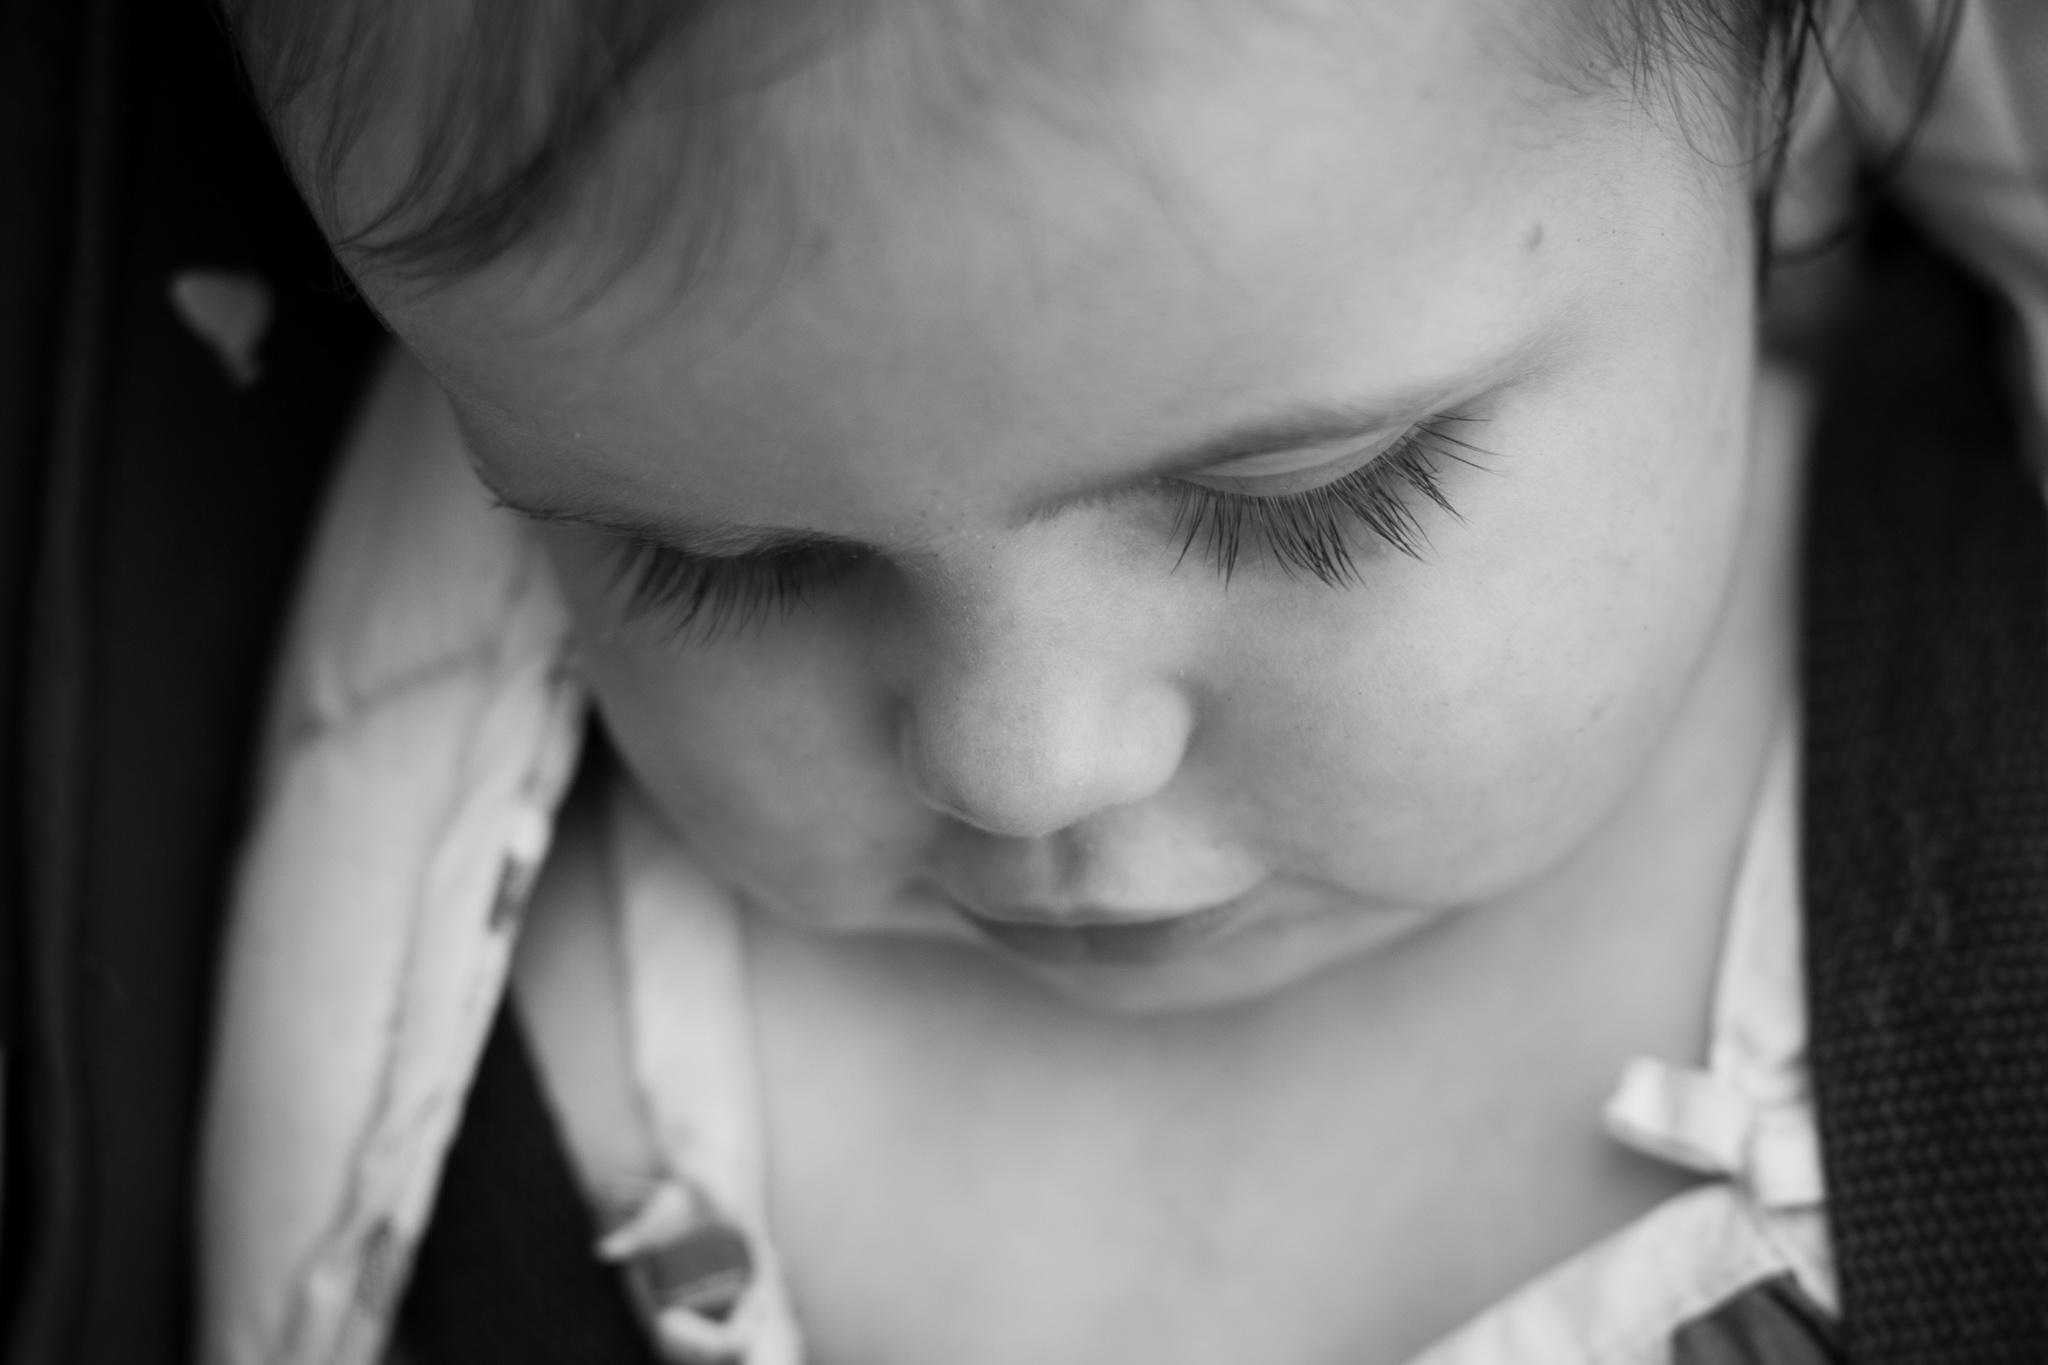 baby eye lashes chubby cheeks professional family photography avoca beach nsw